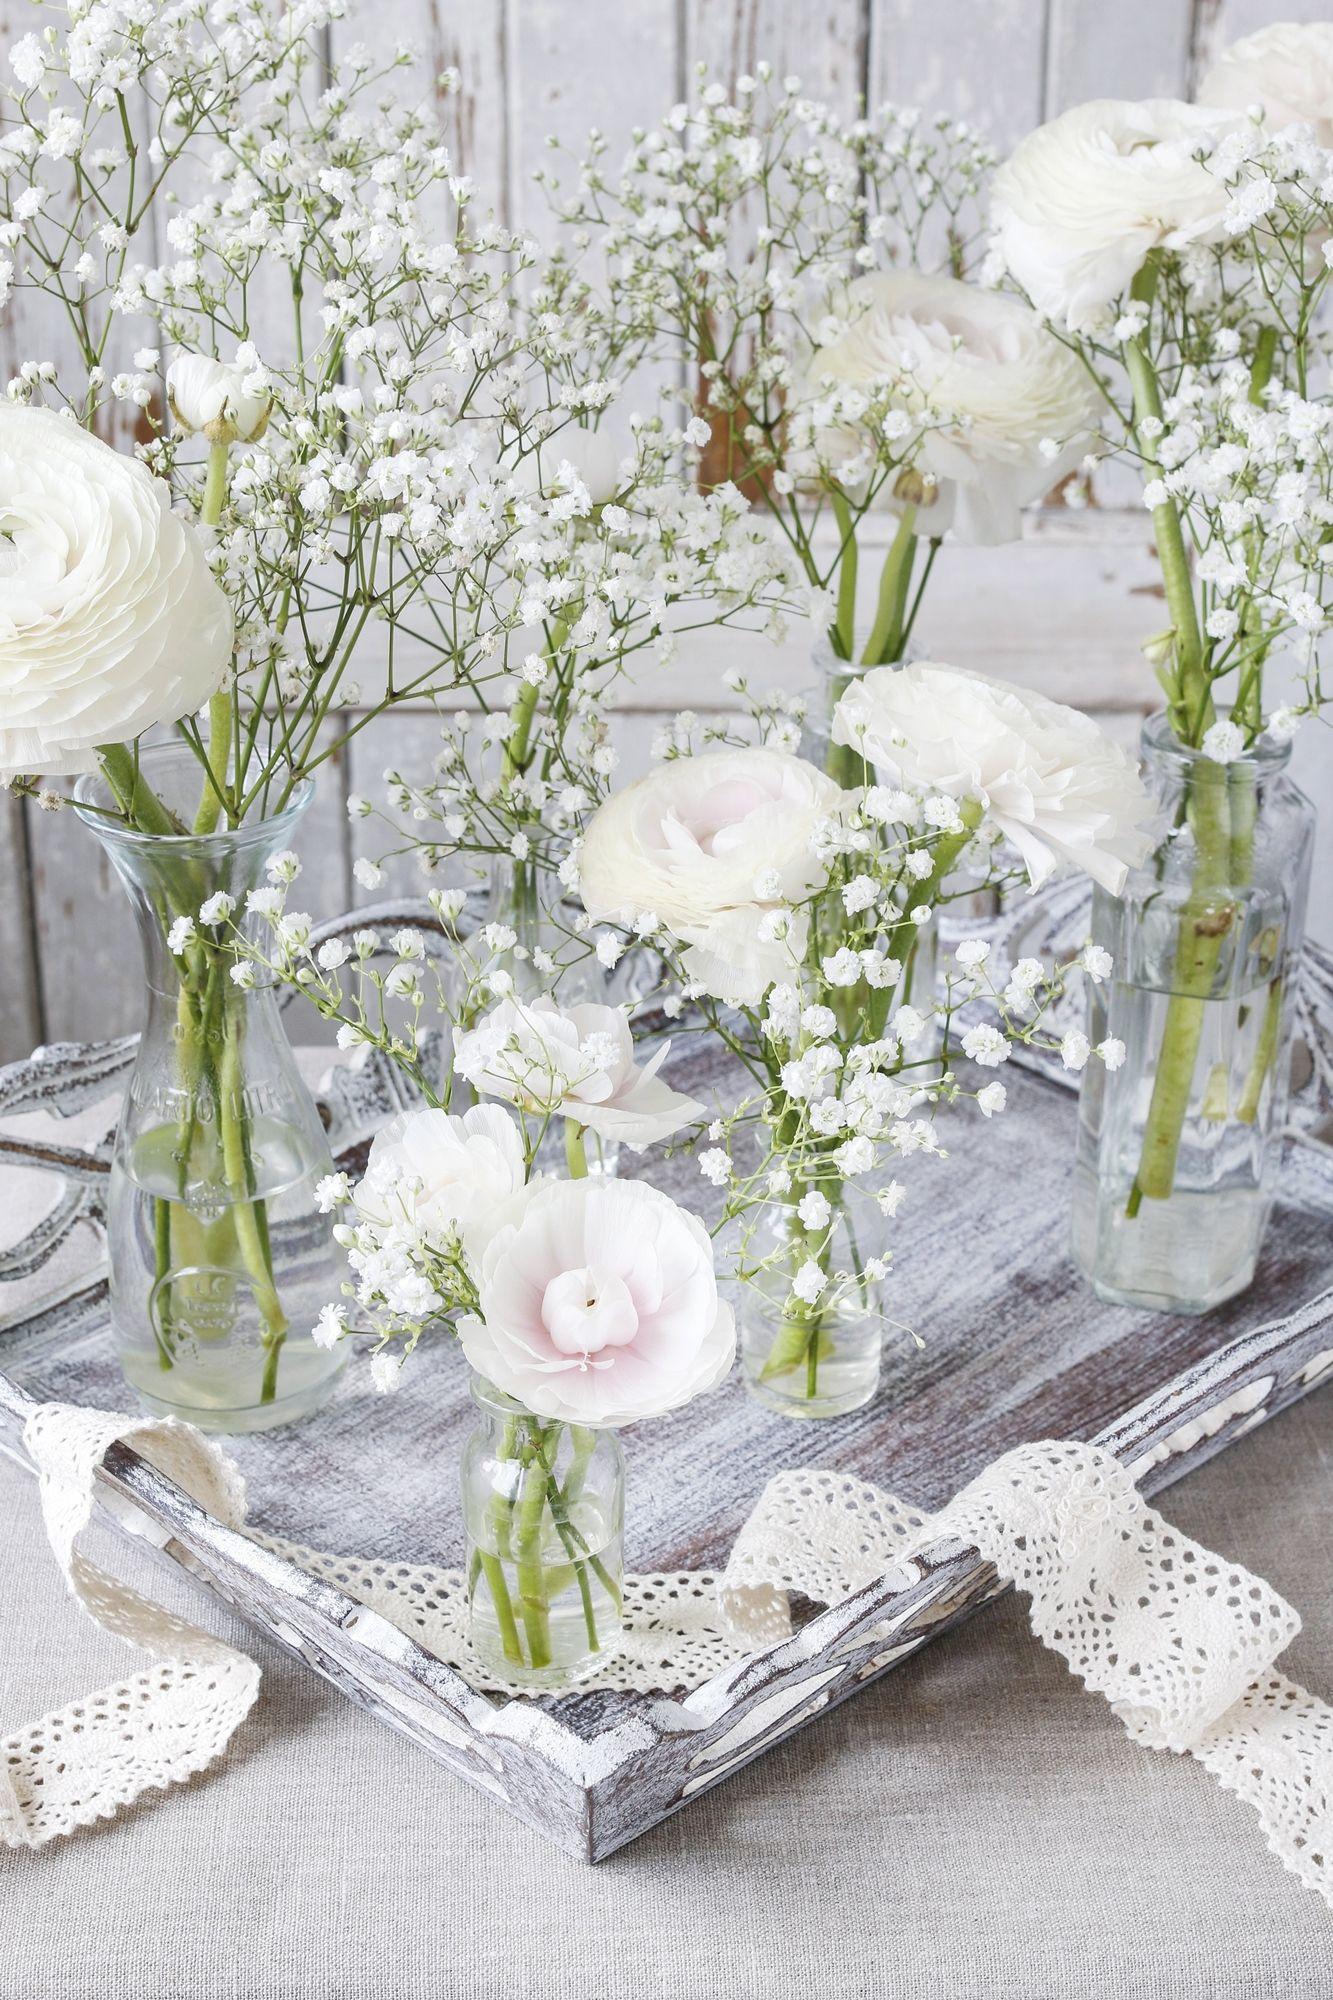 Lovely White Table Via Shuttershock Komunia W 2019